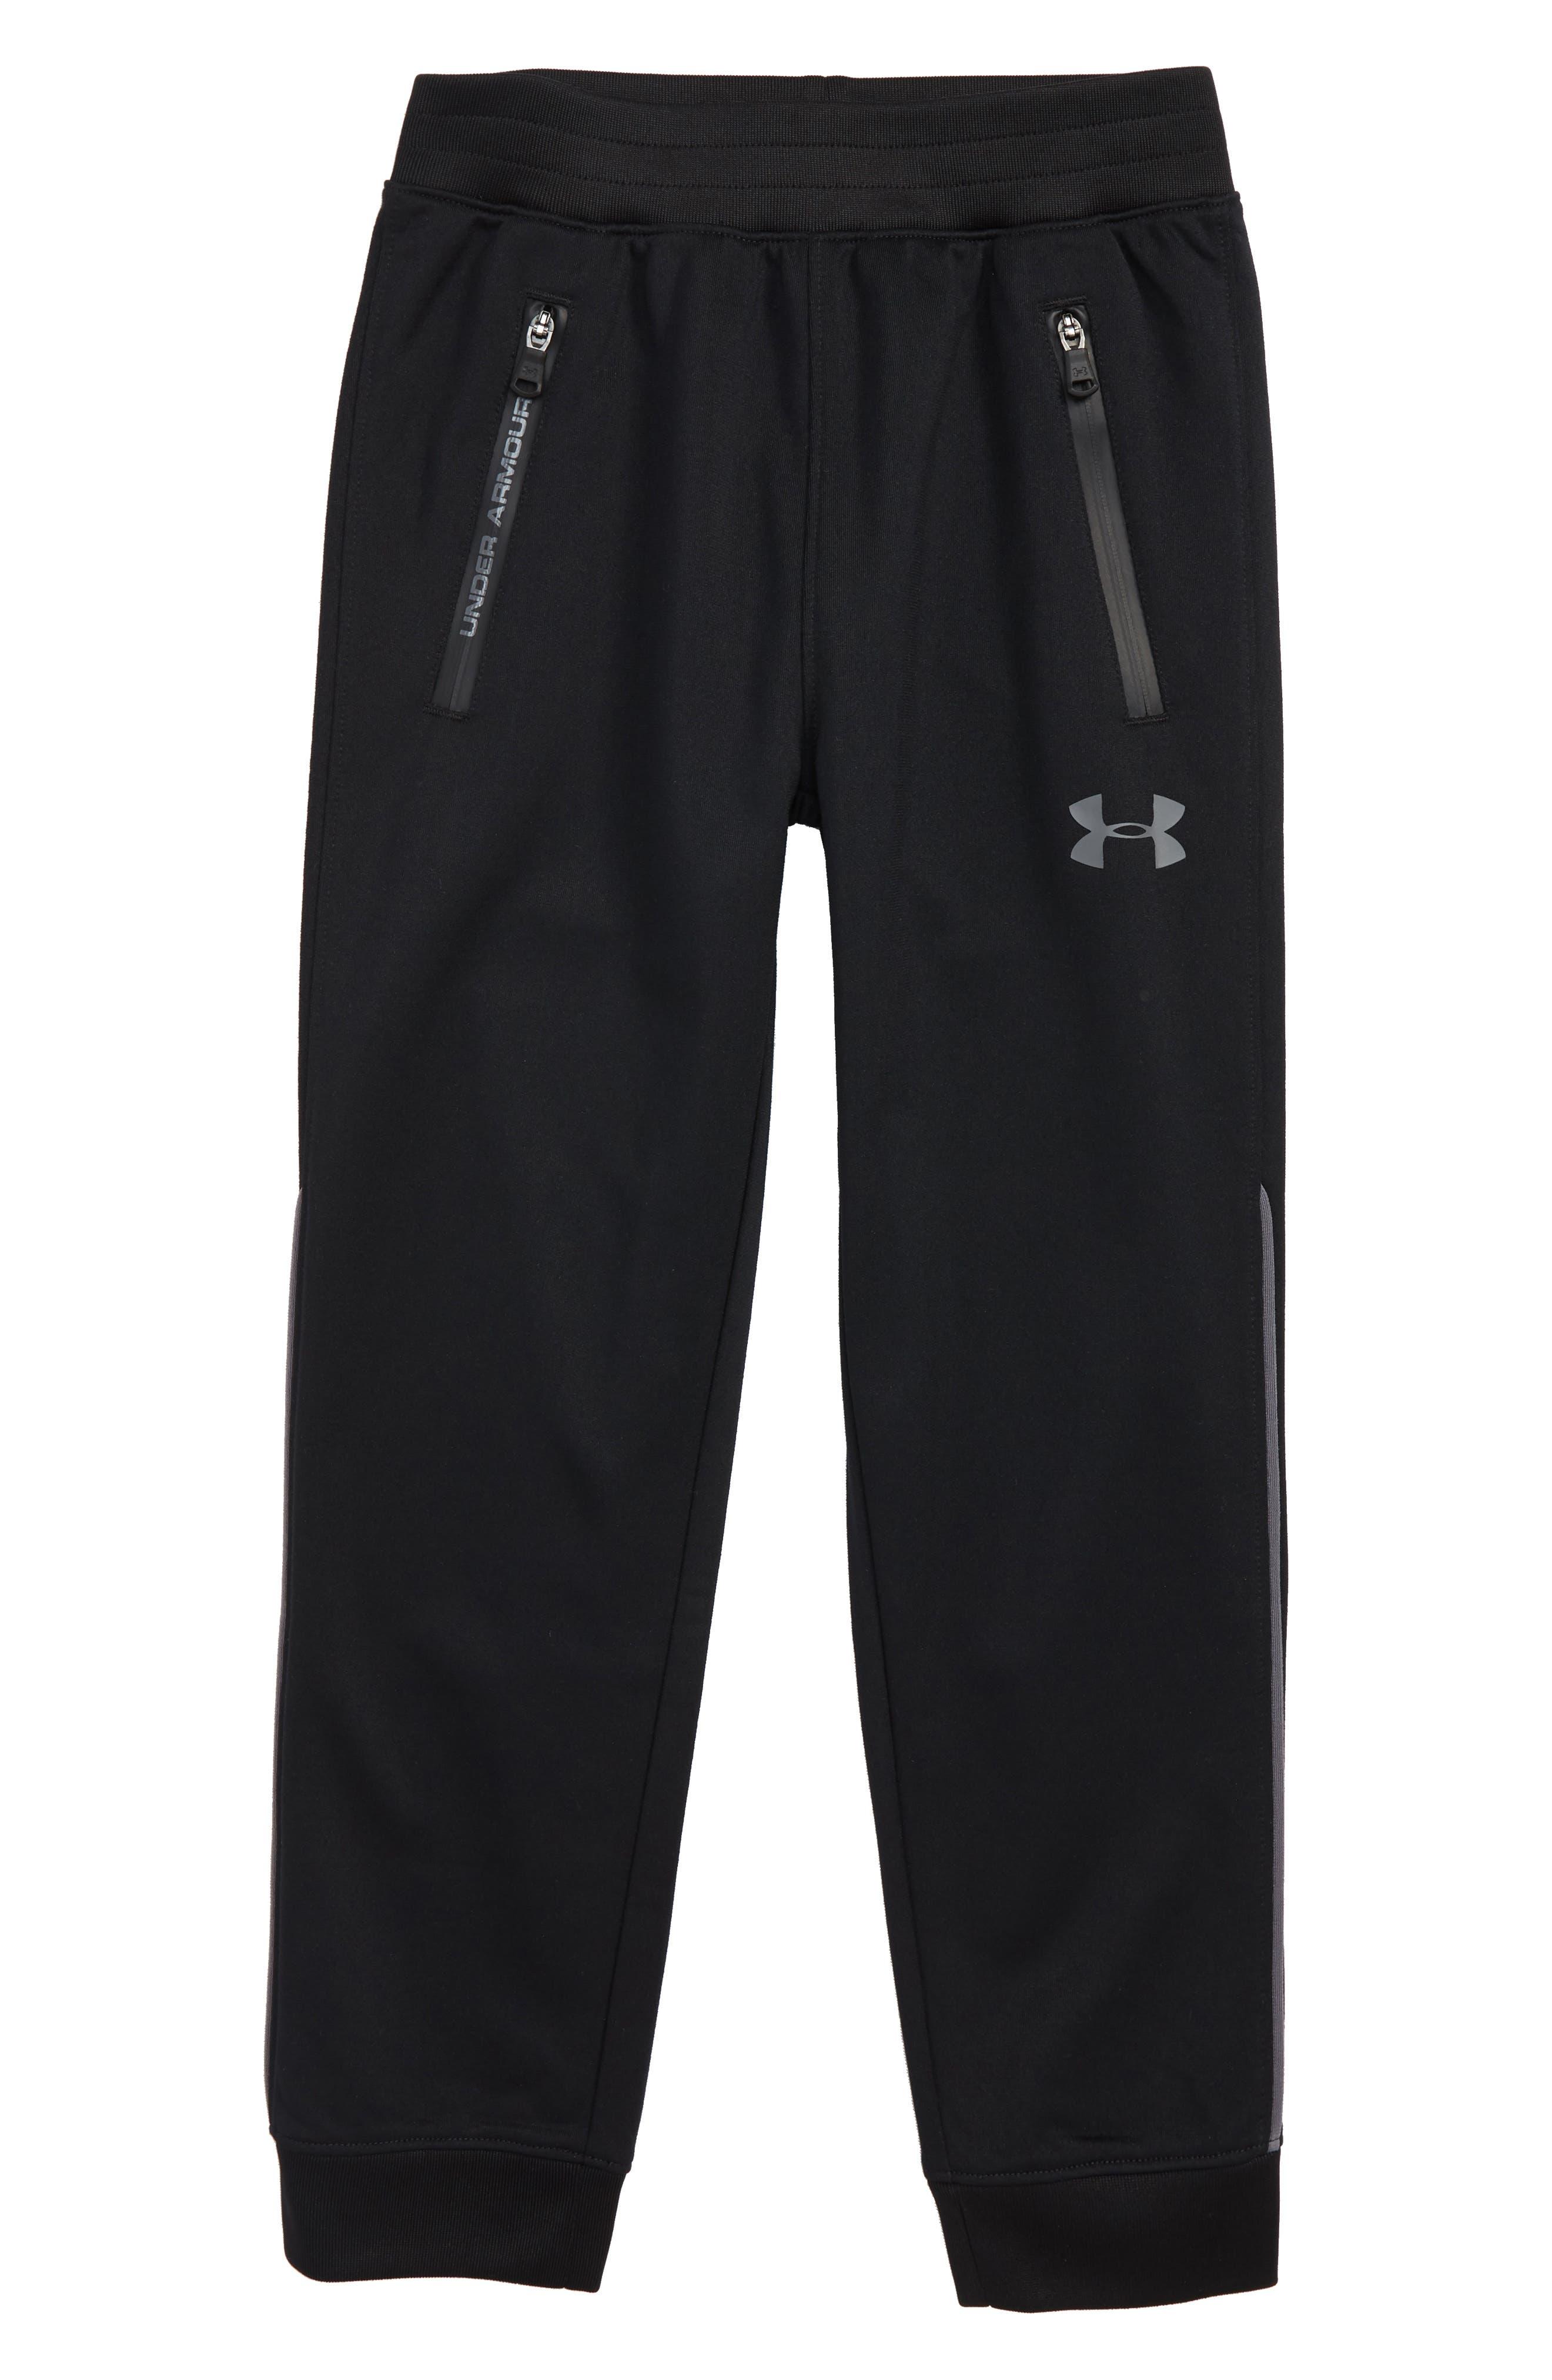 Boys Under Armour Pennant Pants Size 7  Black